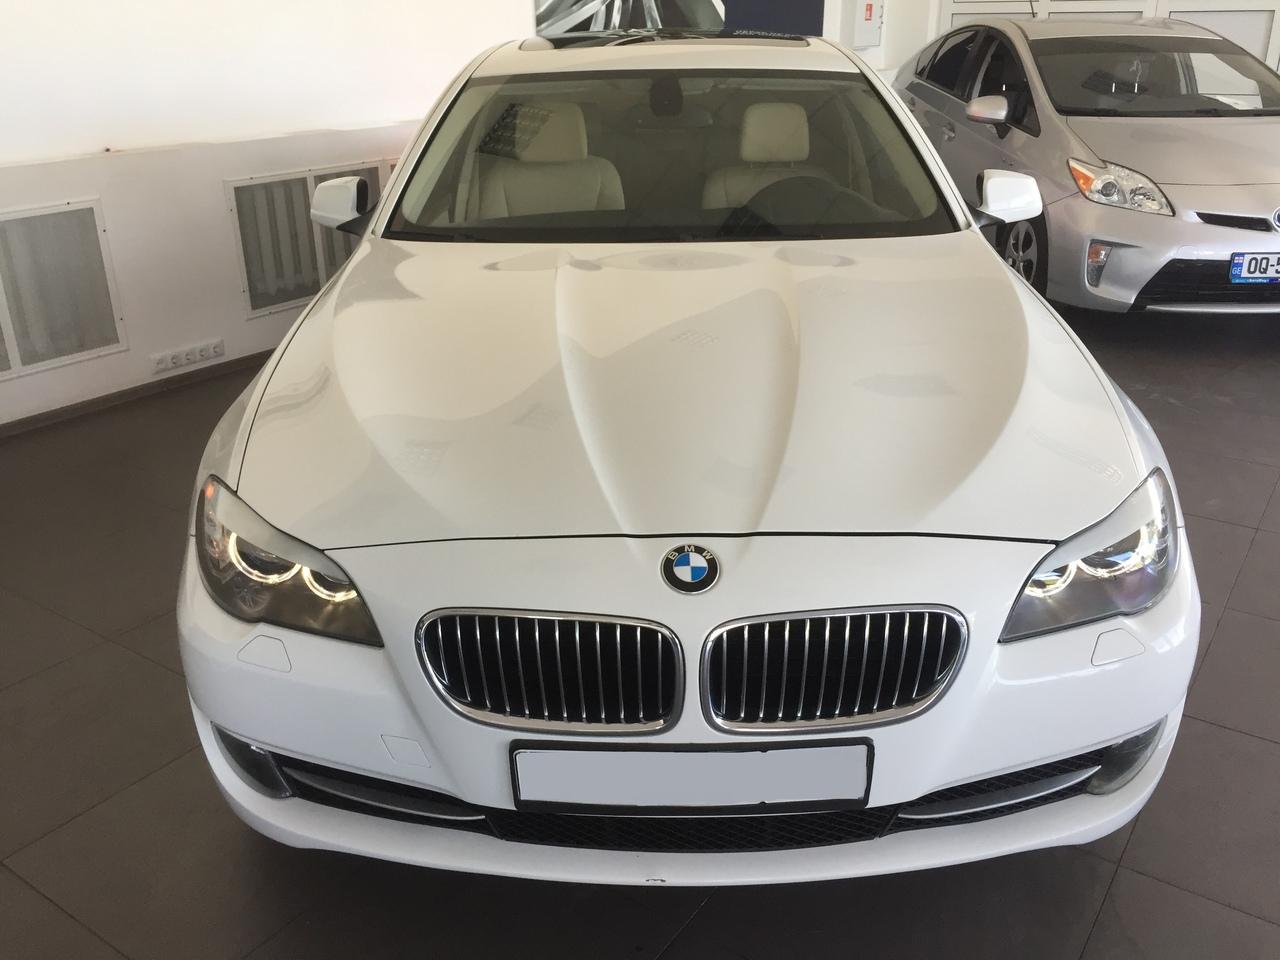 Фотографии BMW 528i в автосалоне Автомир